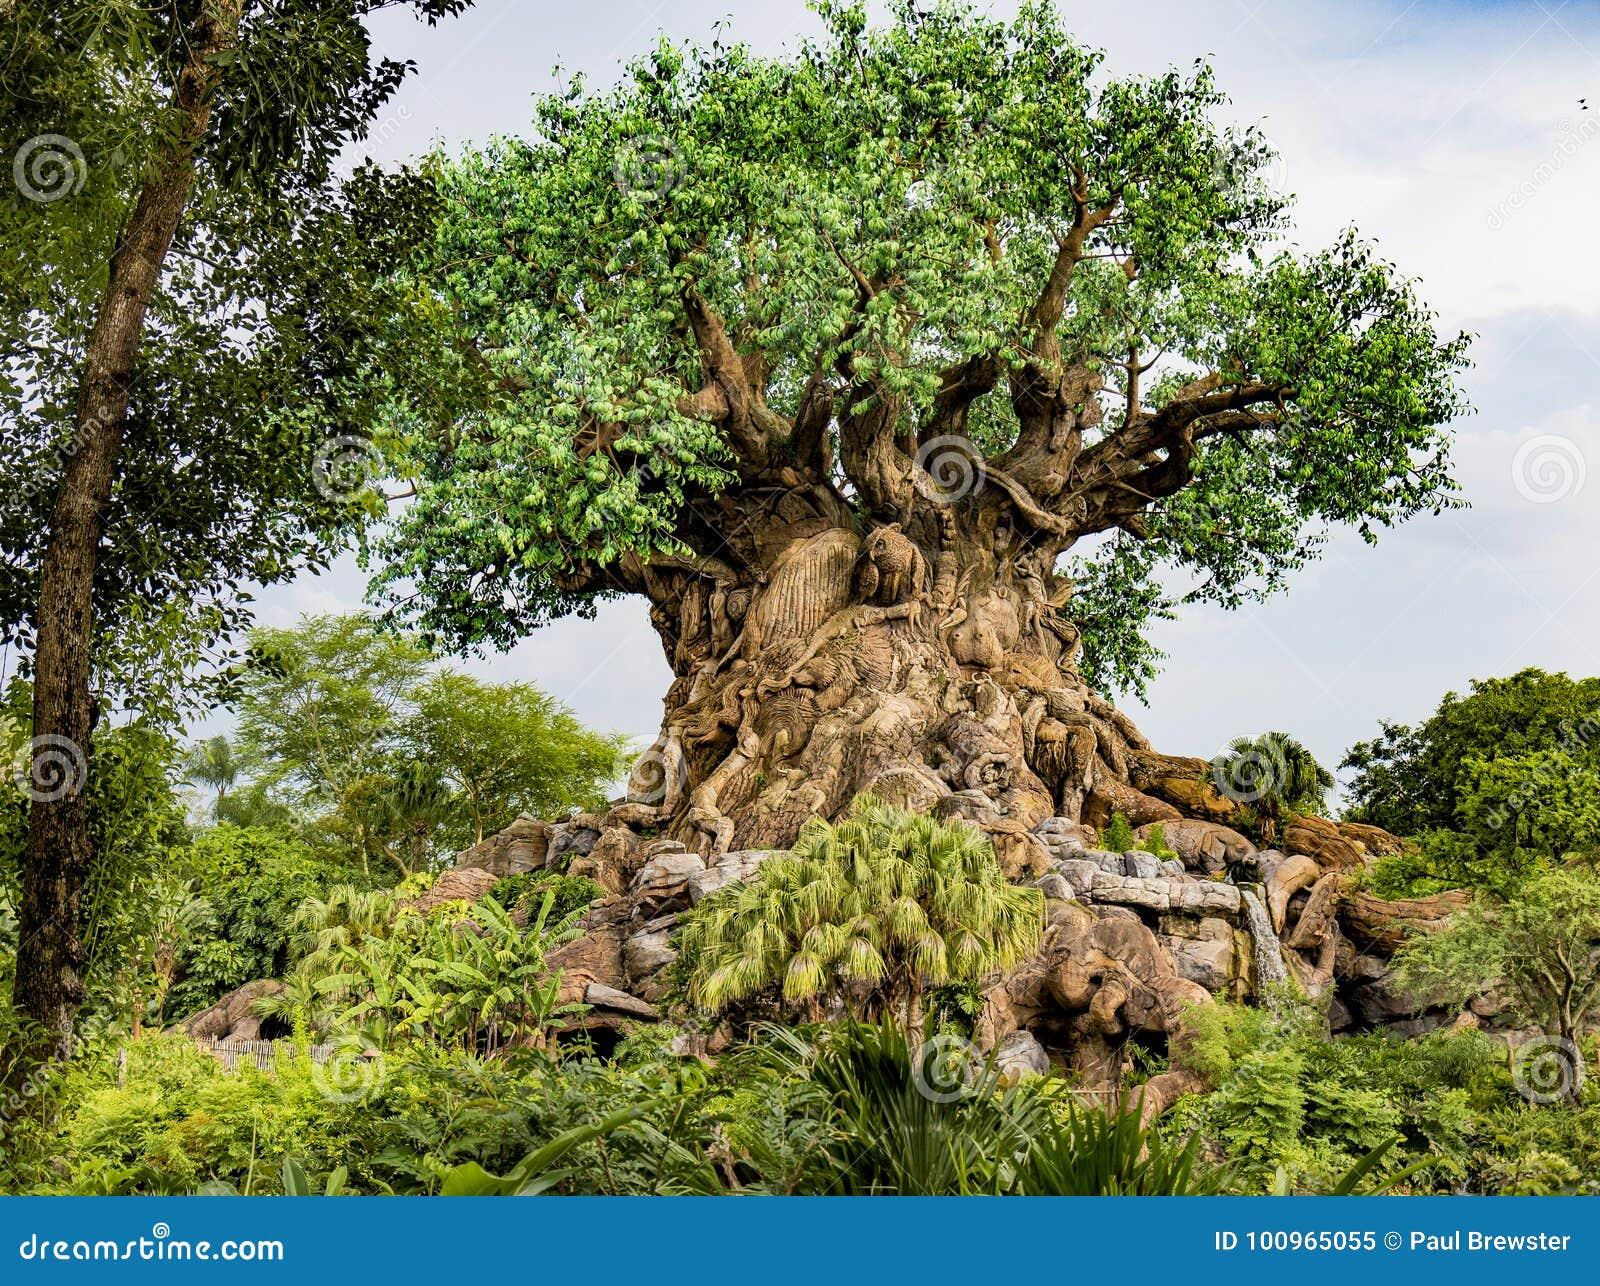 Disney world orlando florida animal kingdom tree of life editorial